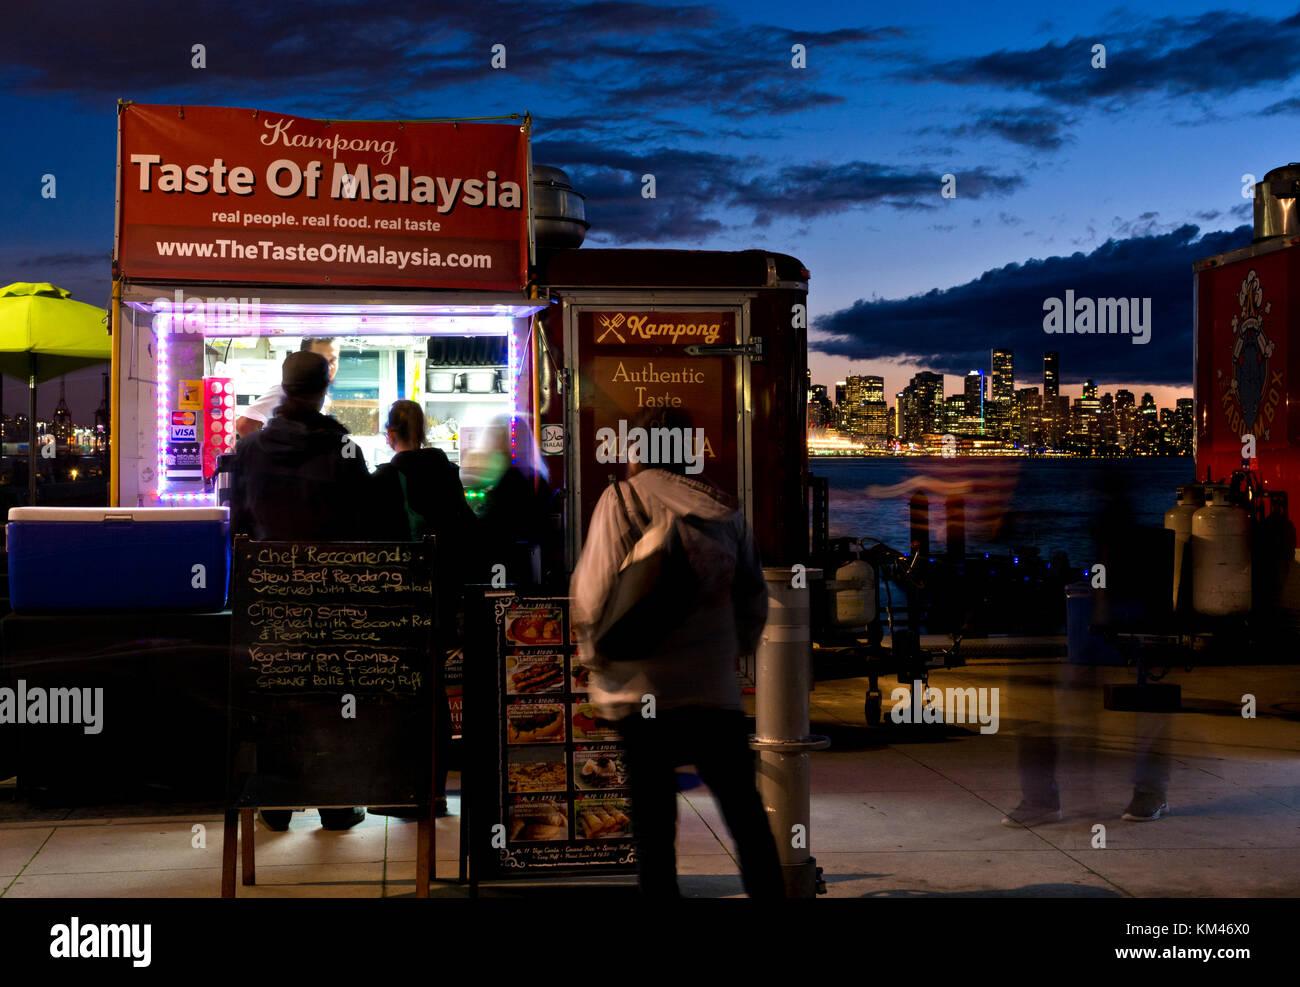 food-truck-at-the-shipyards-night-market